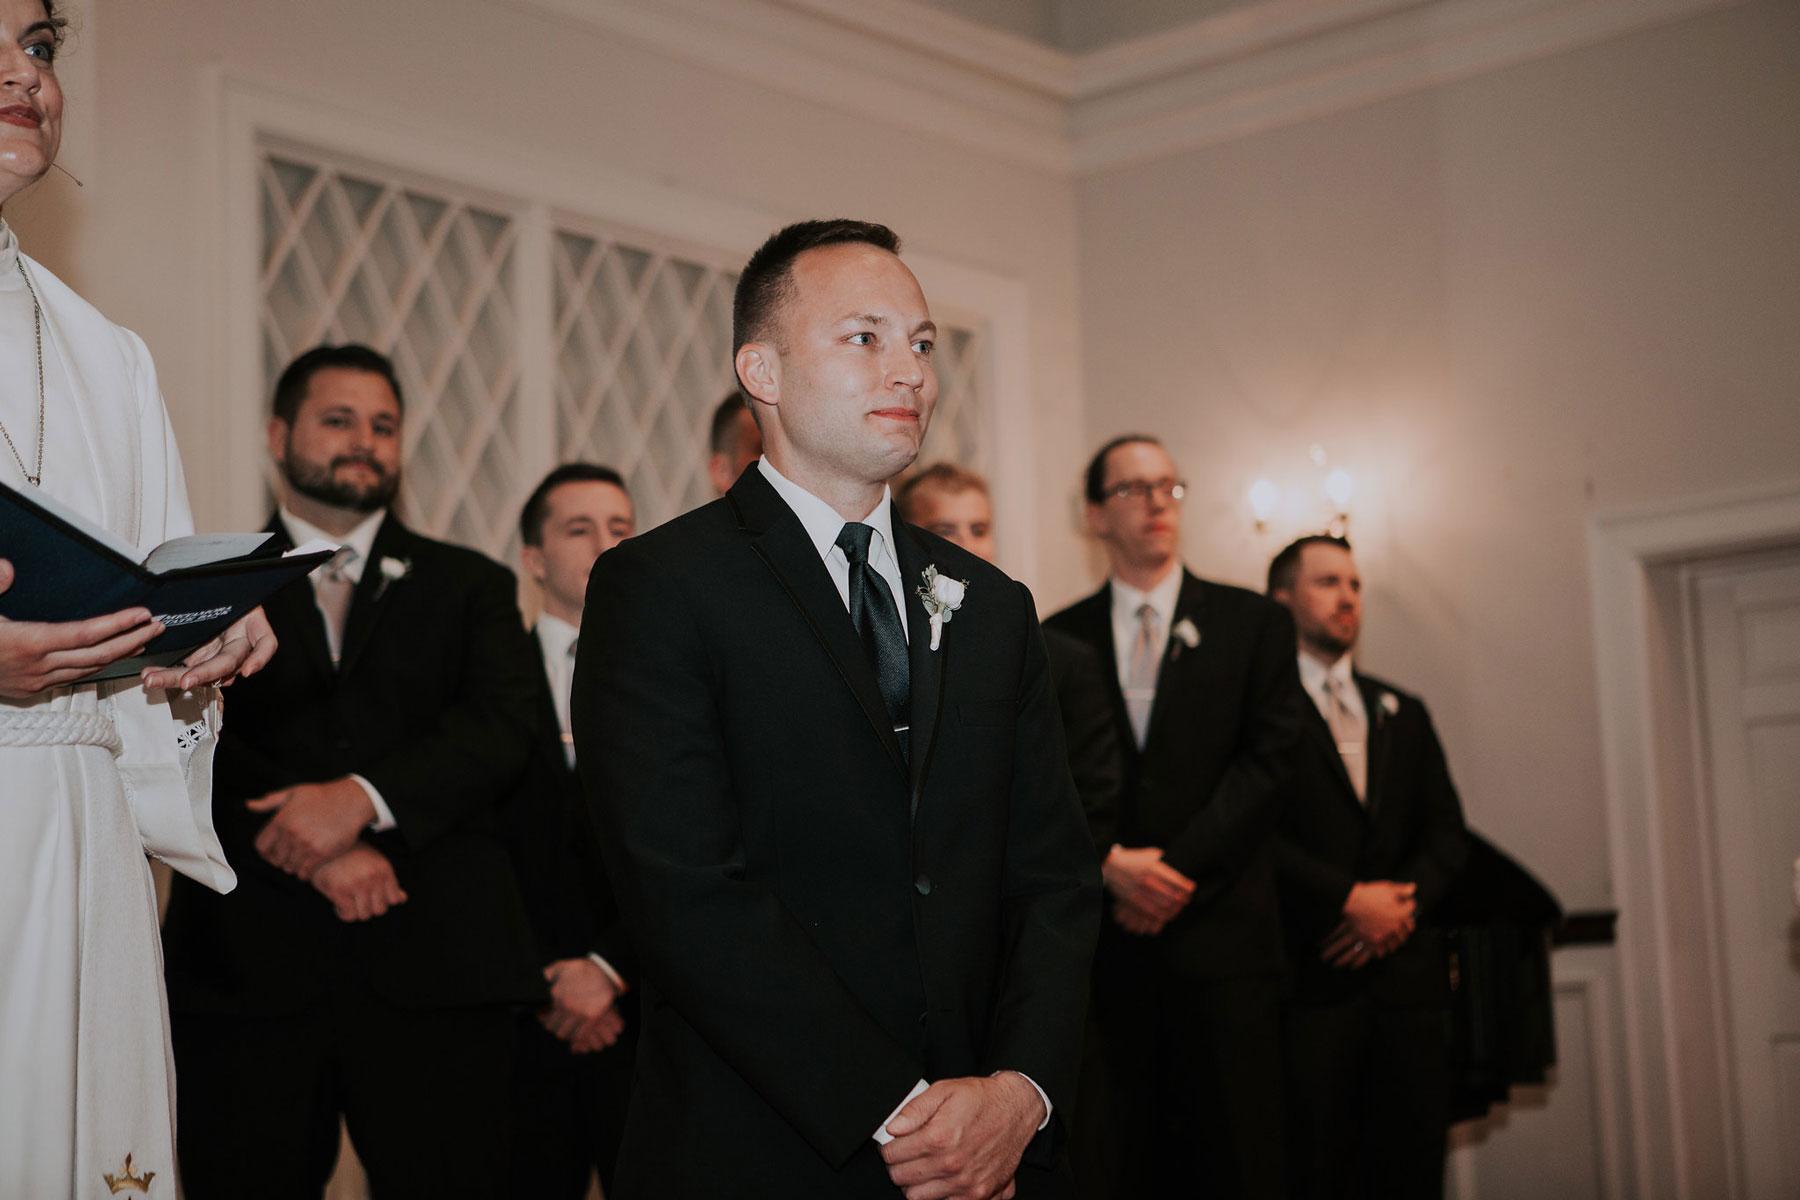 The-Toledo-Club-Wedding-Dana-Doug-Vafa-Photo83.jpg